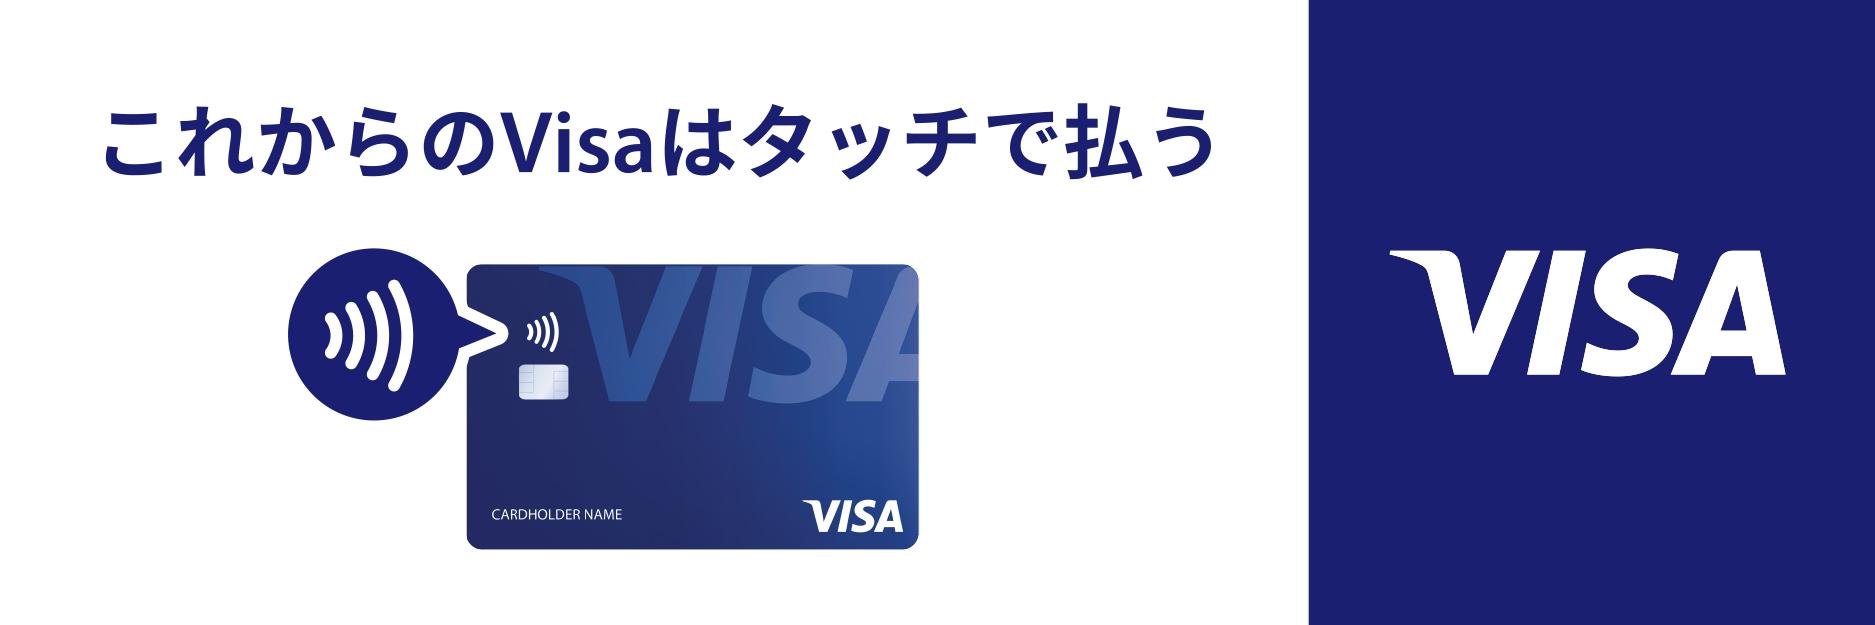 【Visaのタッチ決済】コンタクトレスクレジットカードによる非接触決済 | Visa